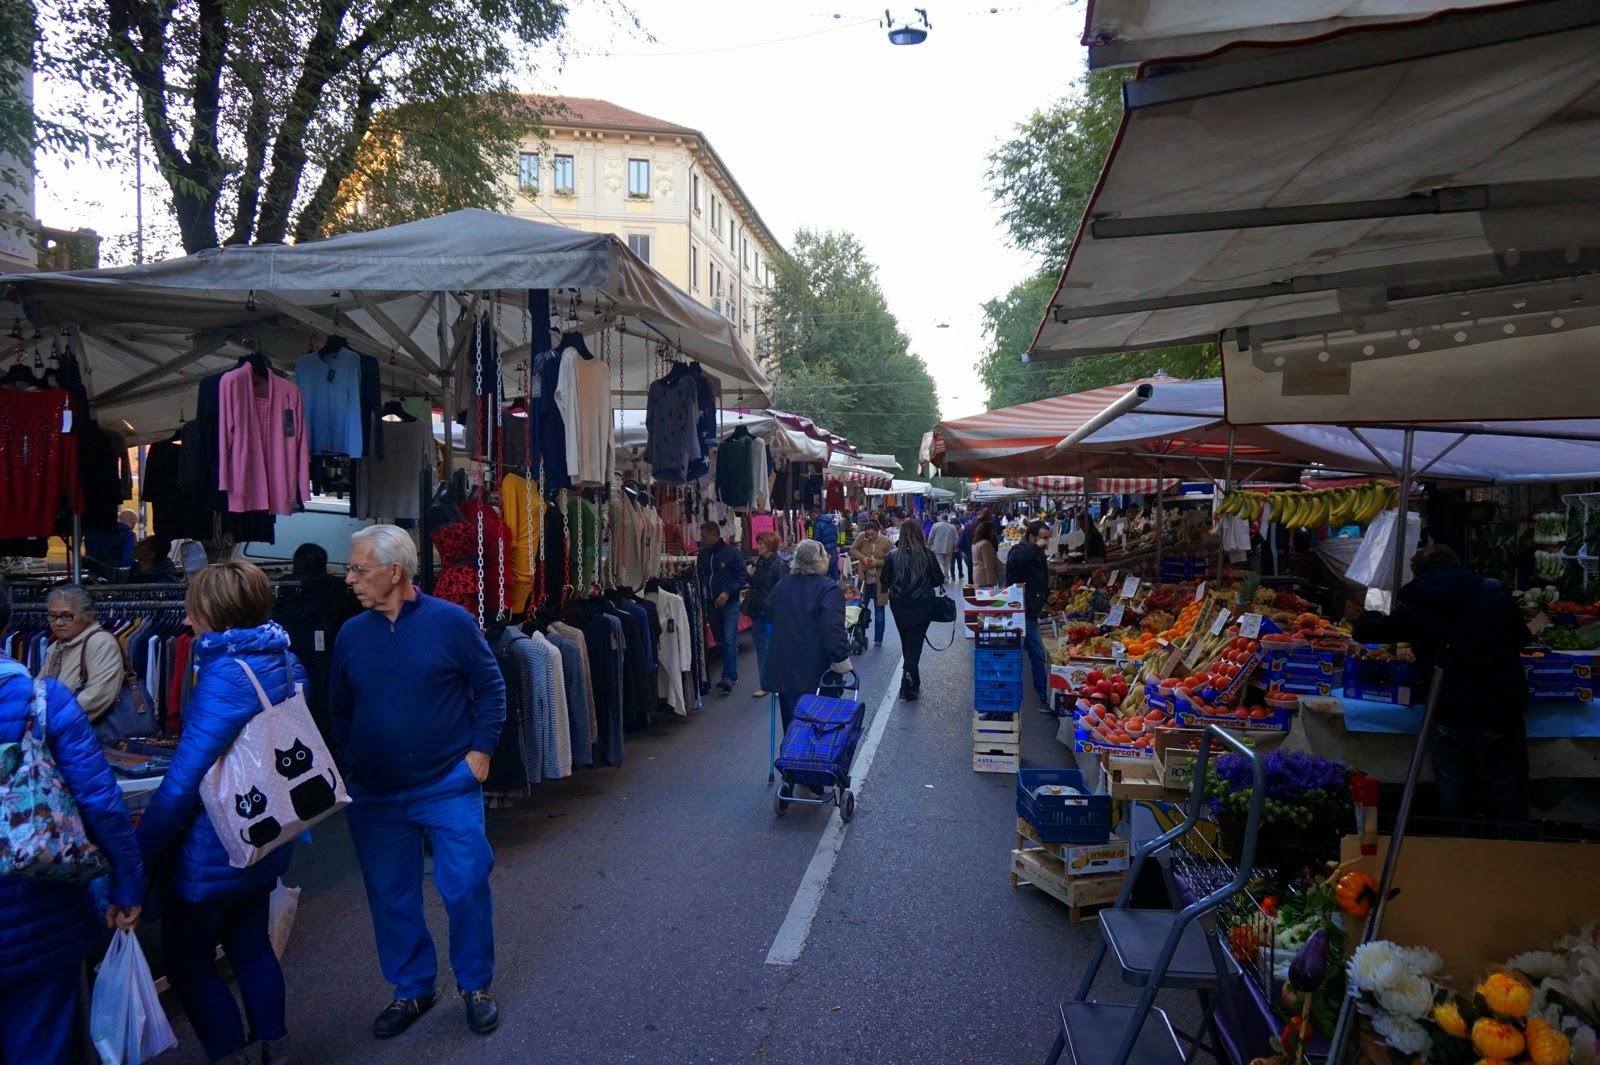 Open air market in milan joie de vivre blog by g4gary for Milan food market